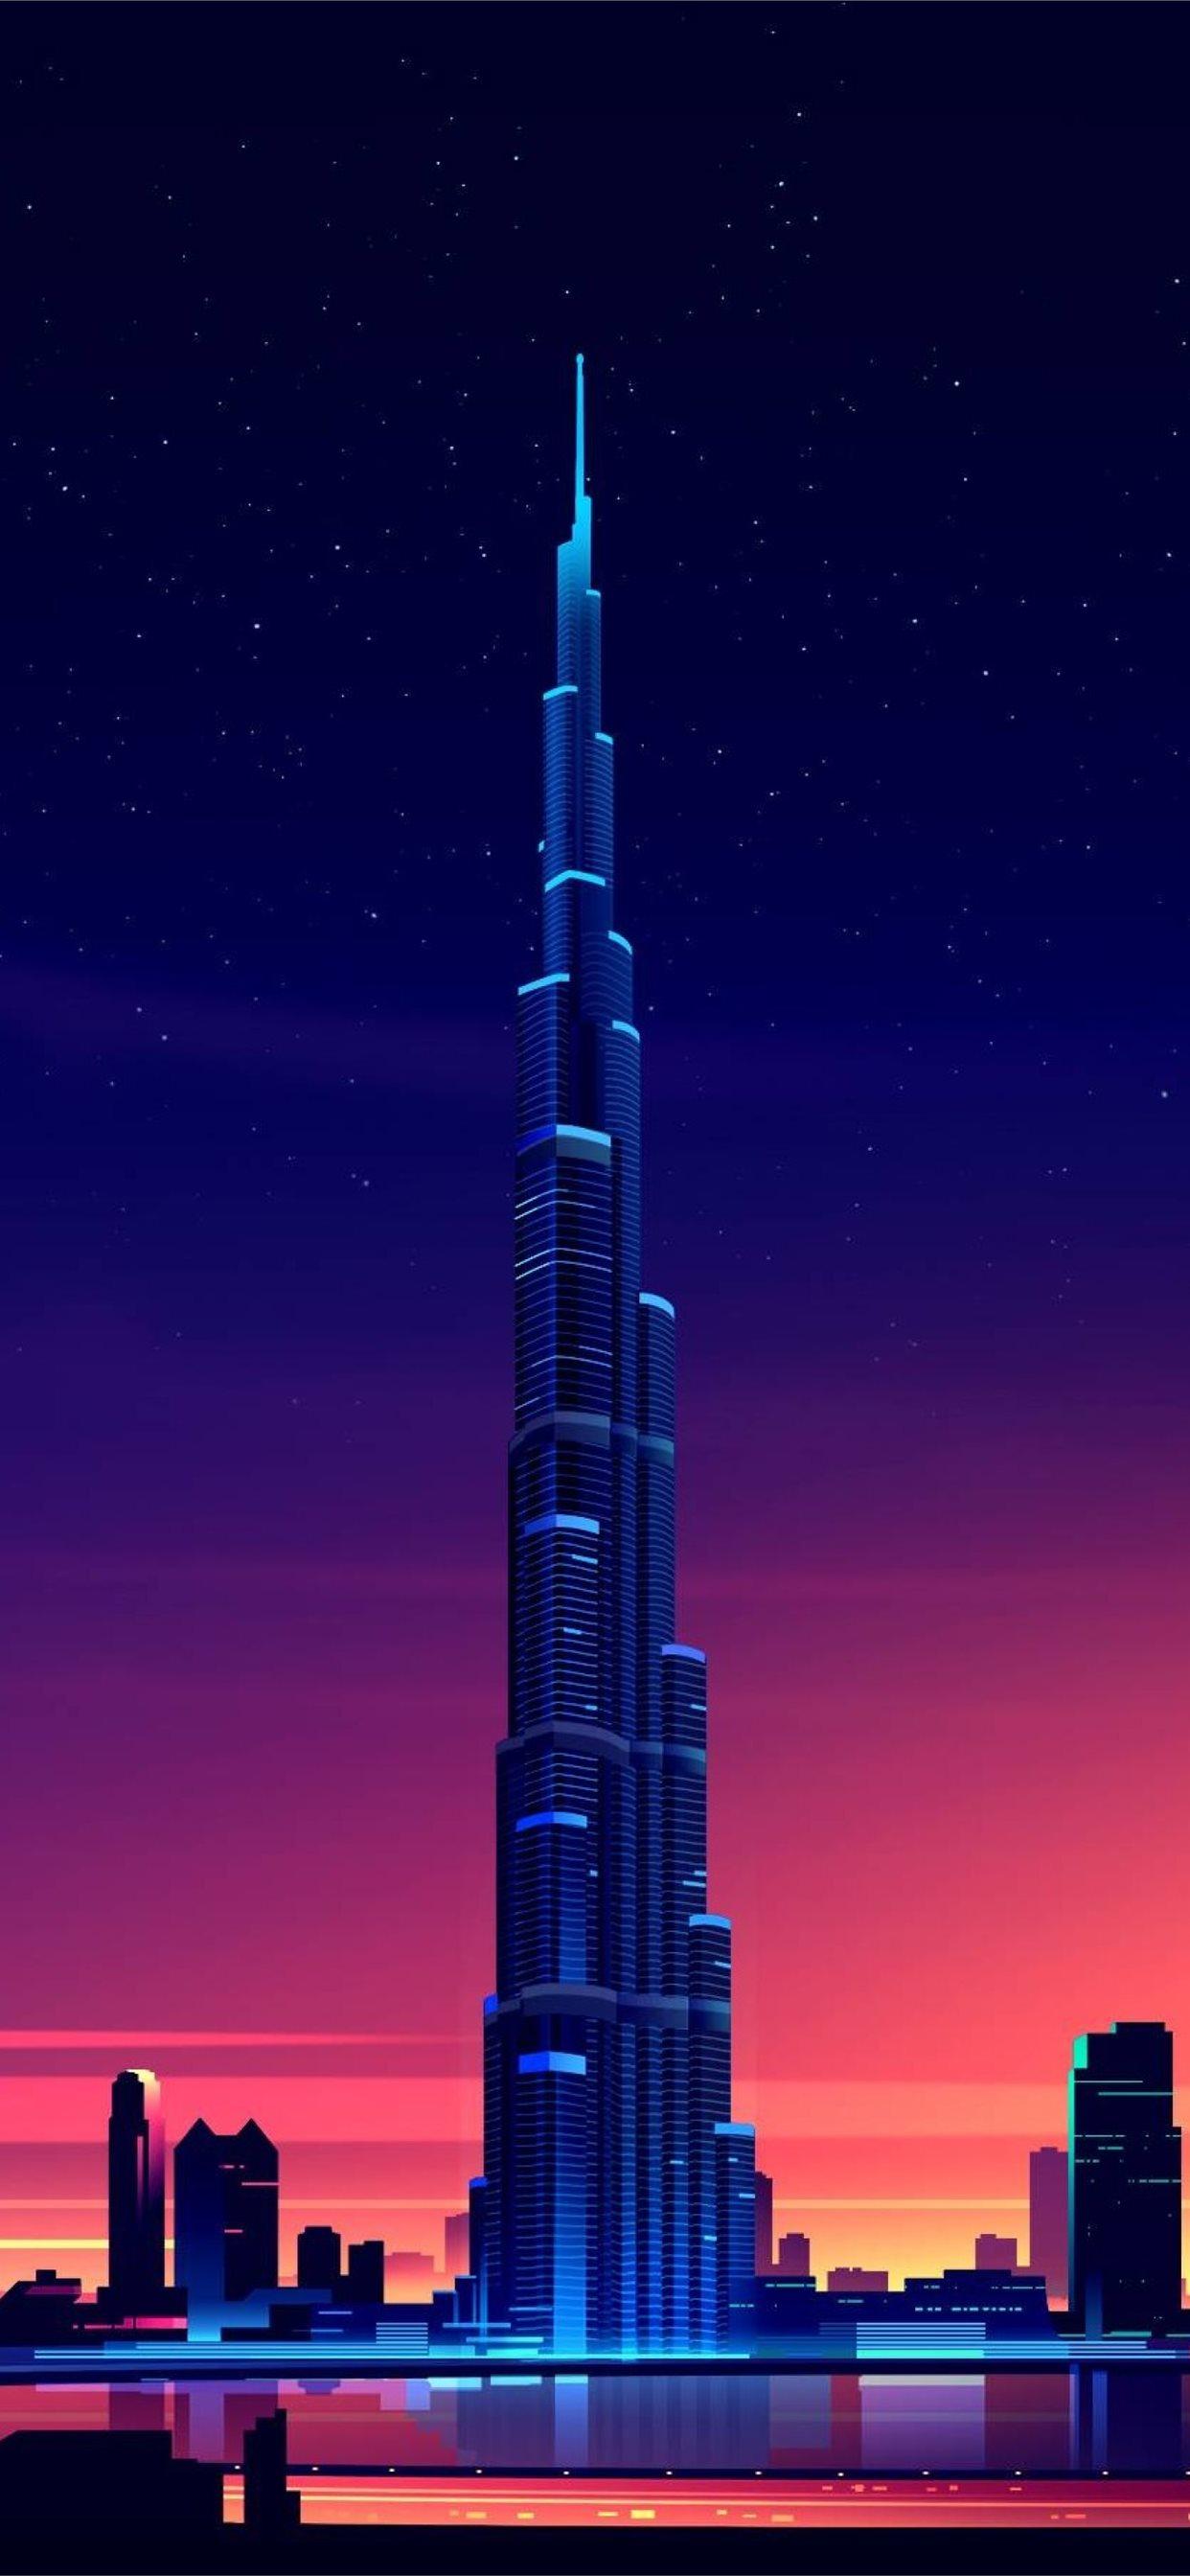 Dubai Burj Khalifa Minimalist Samsung Galaxy Note Iphone 11 Wallpapers Free Download